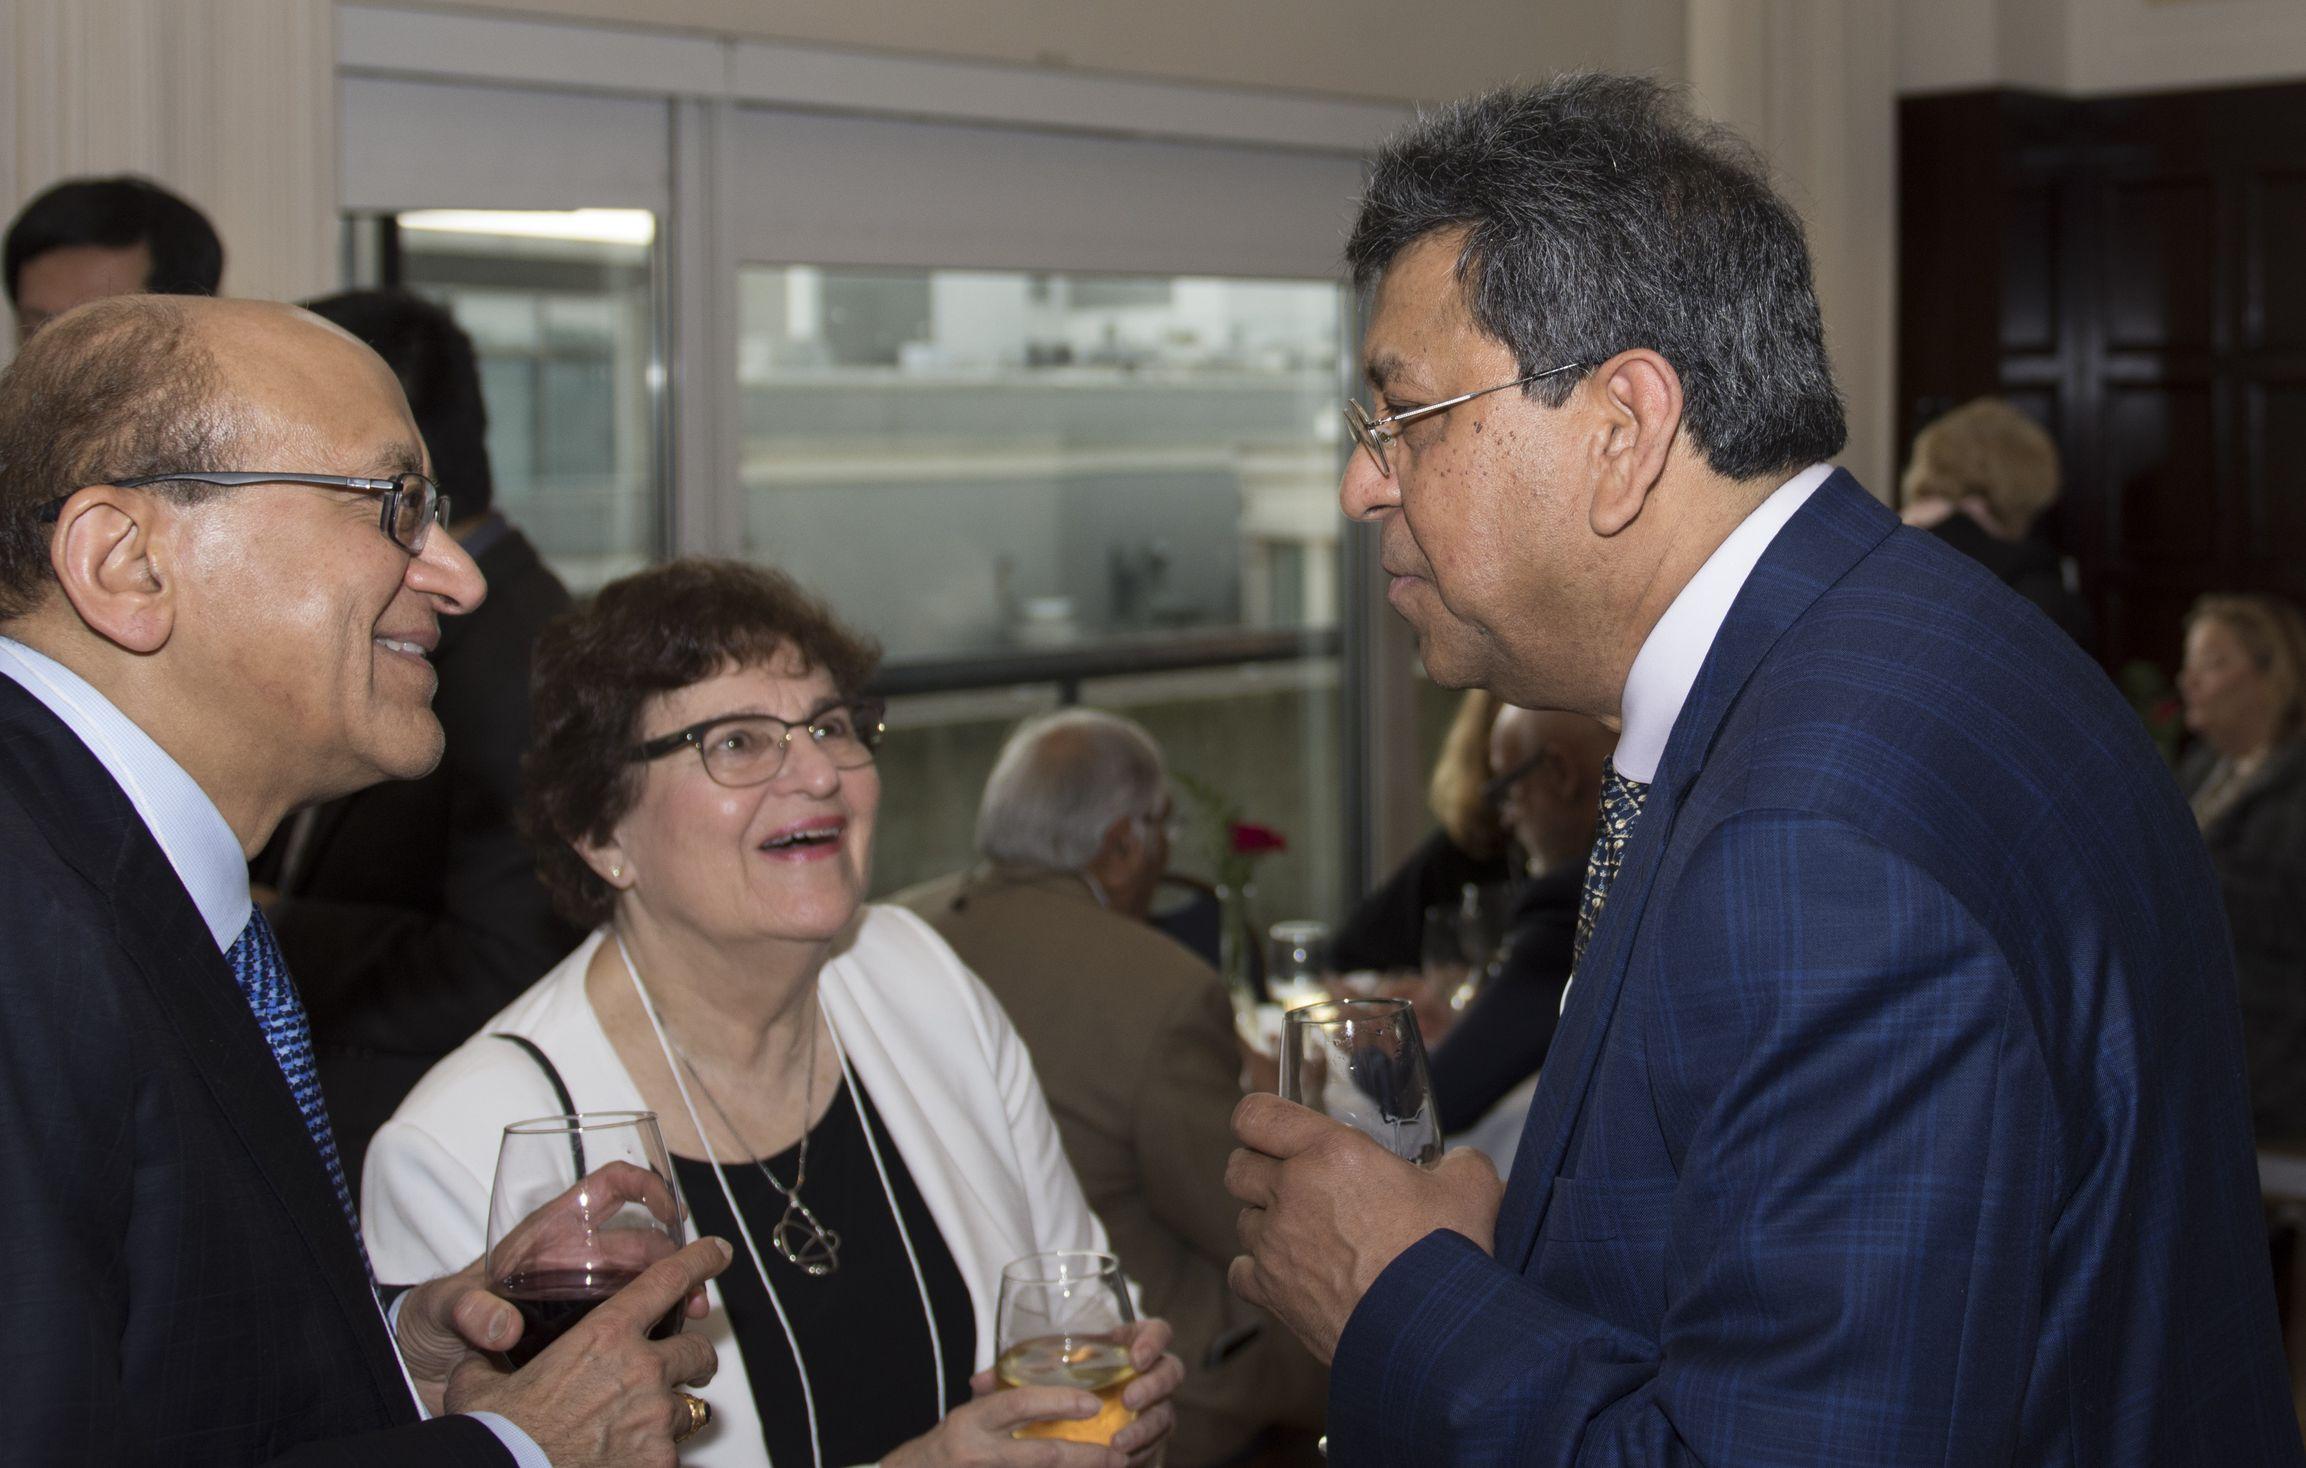 NFCR scientists Drs. Rakesh Jain of Massachusettes General Hospital and Susan Horwitz of Albert Einstein School of Medicine relish a moment with NAS member, Dr. Aravinda Chakravarti of John Hopkins University